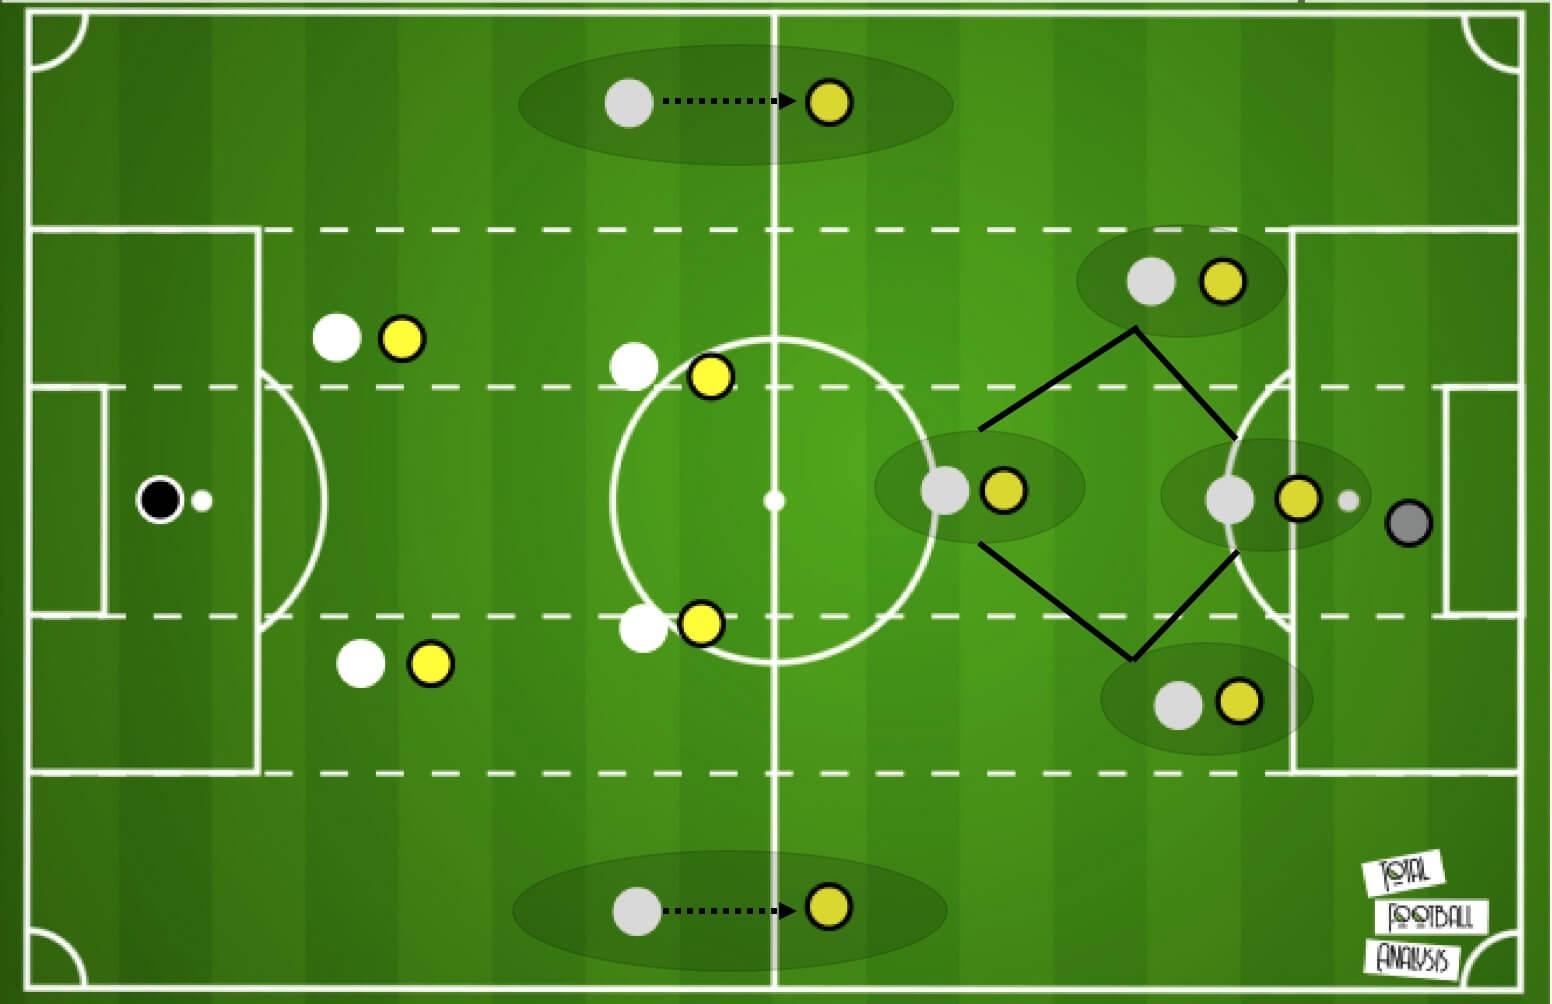 Premier League 2020/21: Wolverhampton Wanderers vs Manchester City - tactical analysis tactics